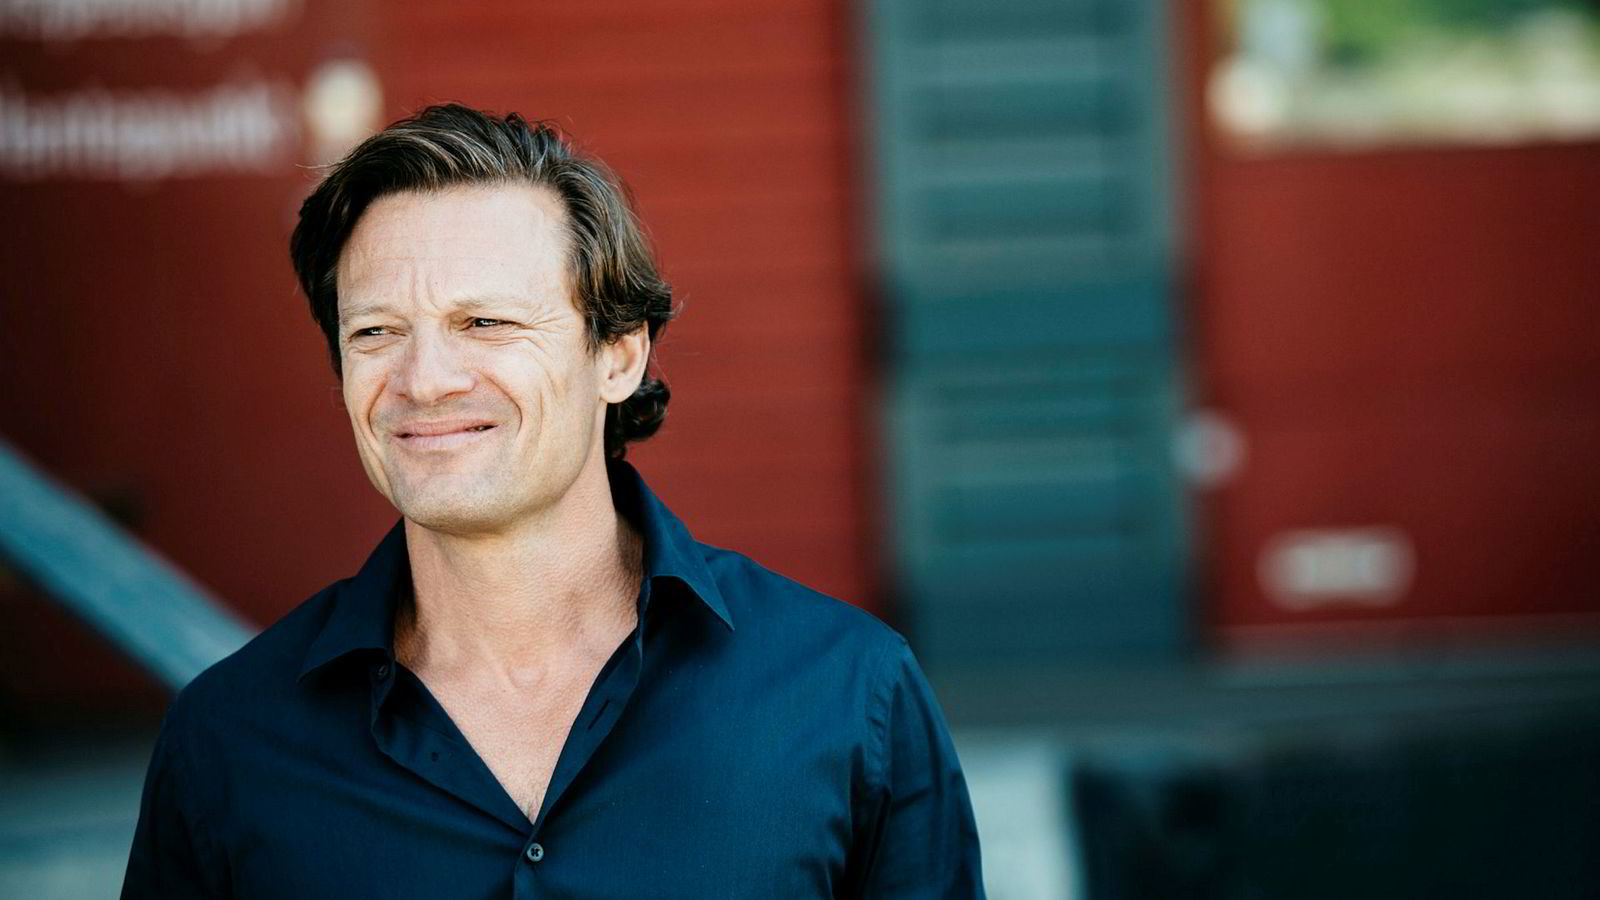 Morten Angelil er ikke fornøyd med sitt resultat i fjor, selv om han tjente 40 millioner.